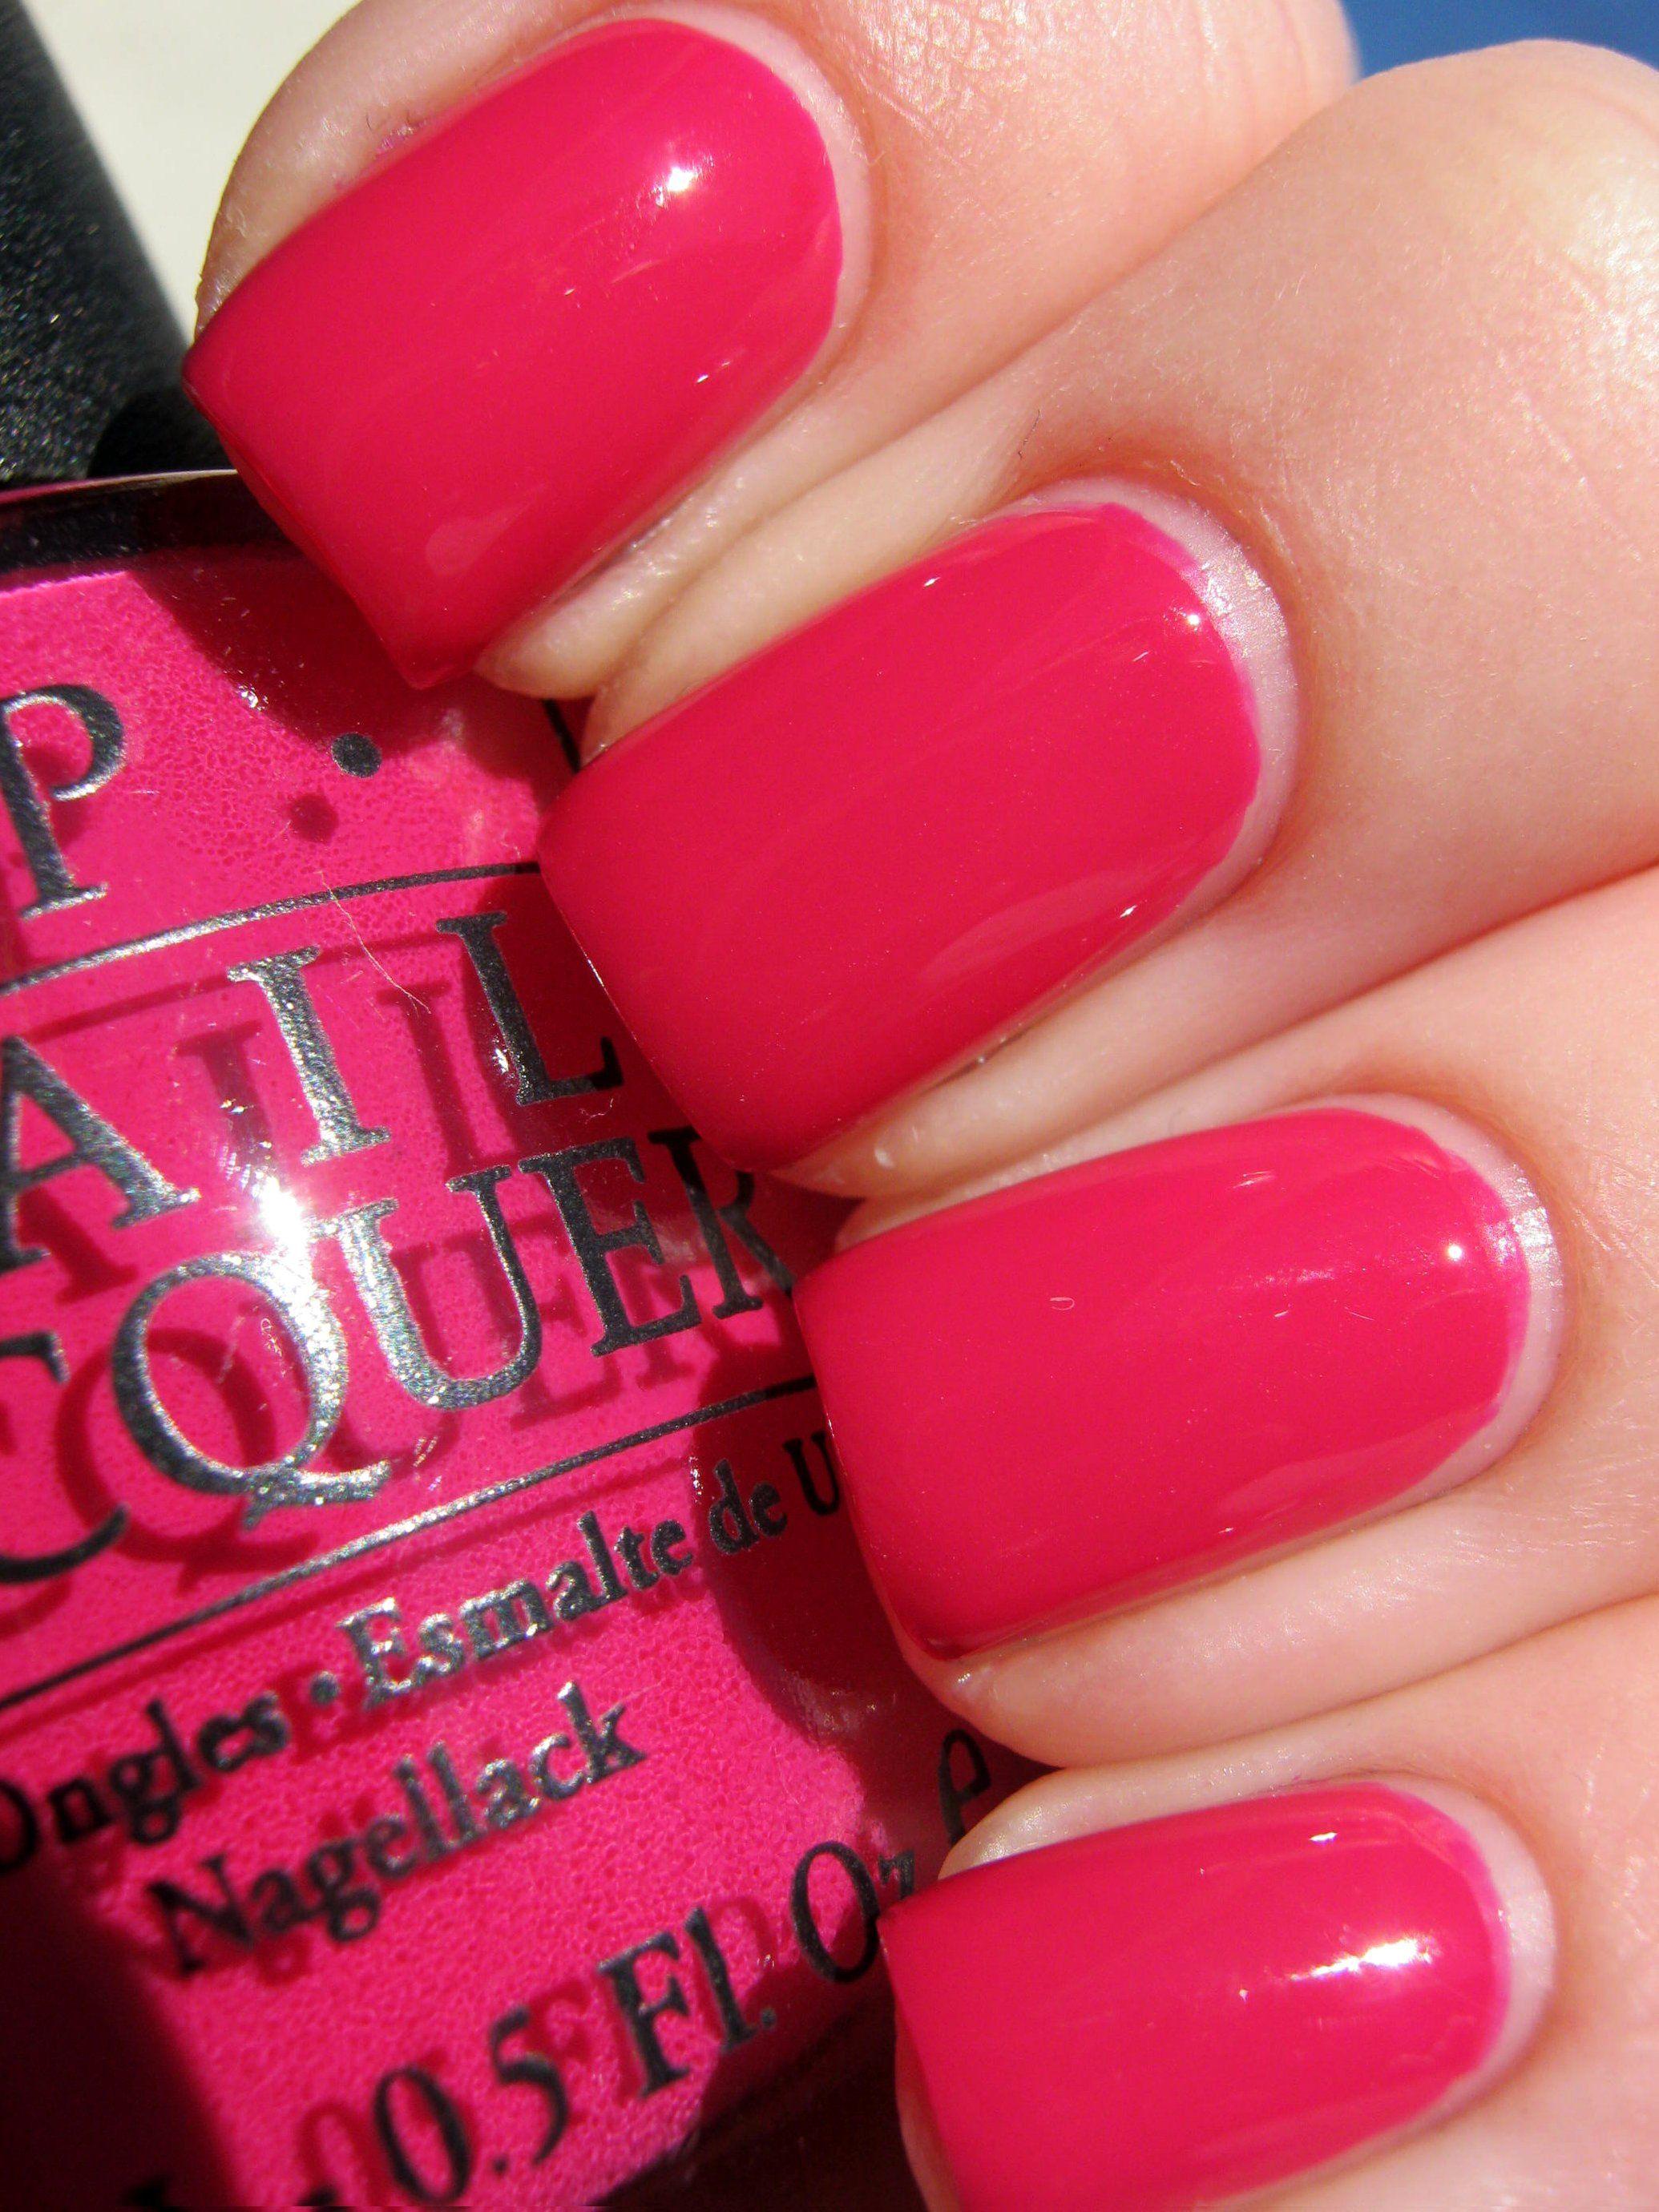 koala berry nail polish - Google Search | Nails | Pinterest